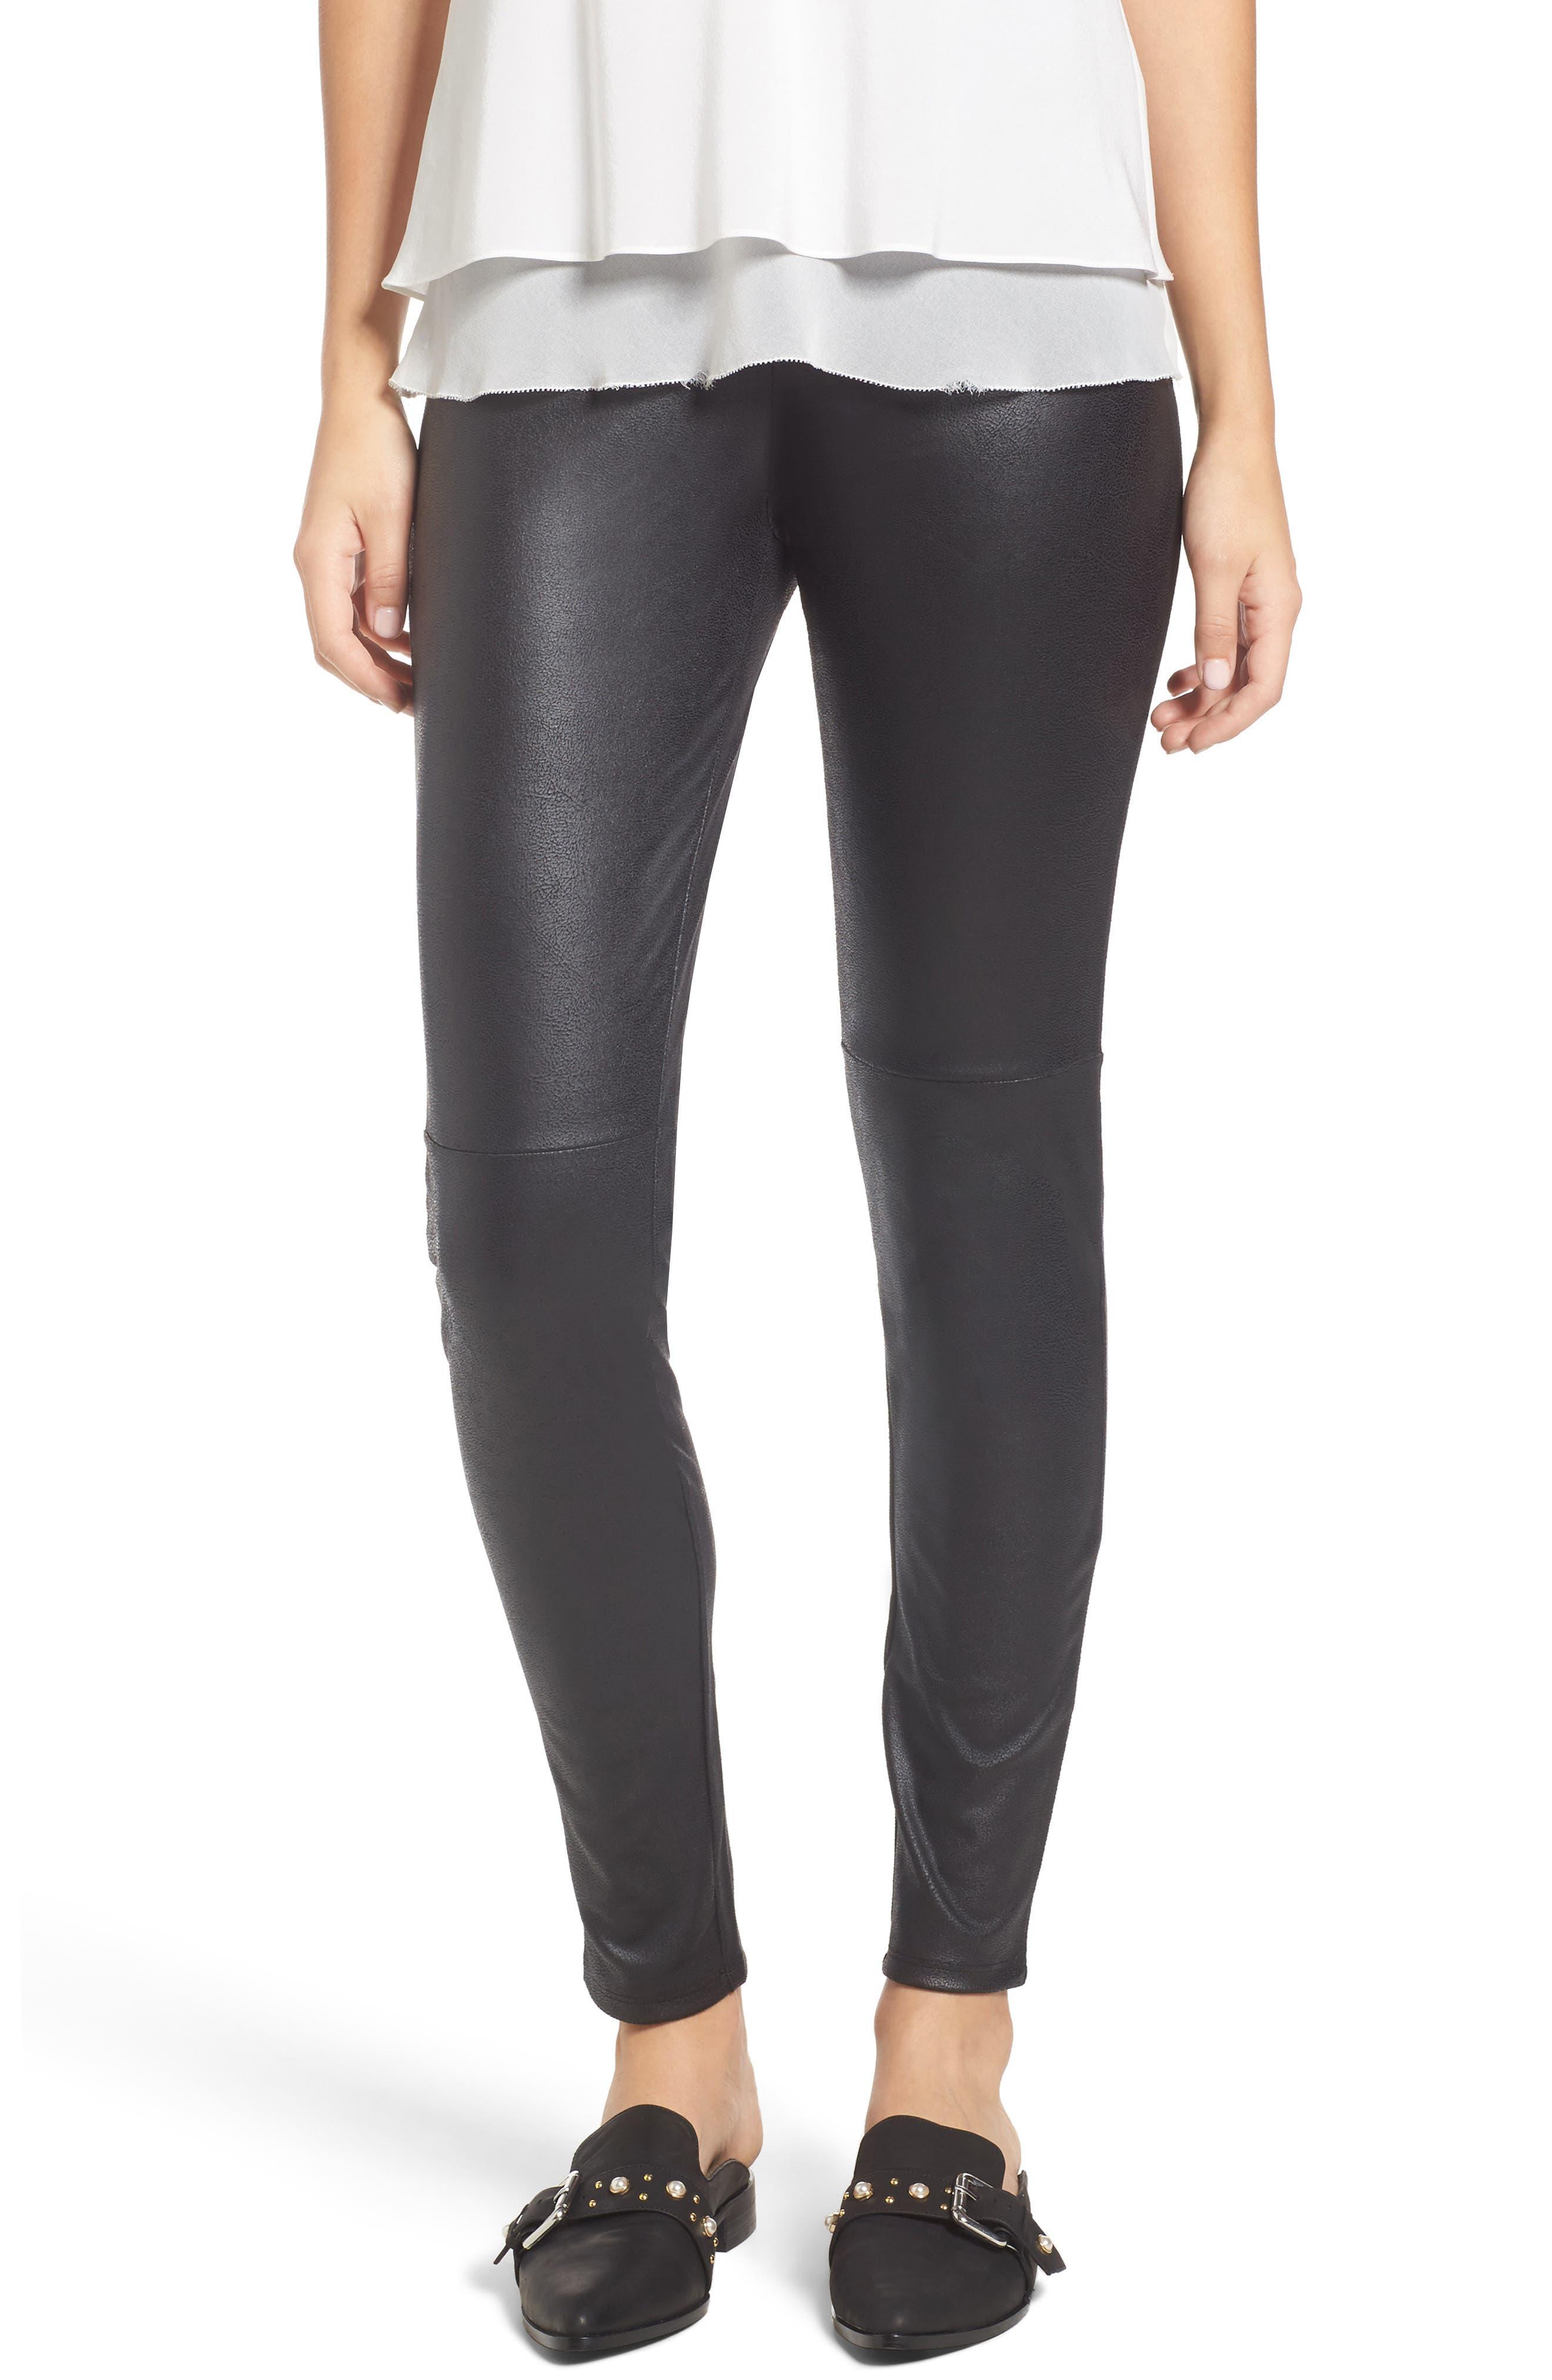 Alternate Image 1 Selected - Trouvé High Waist Faux Leather Leggings